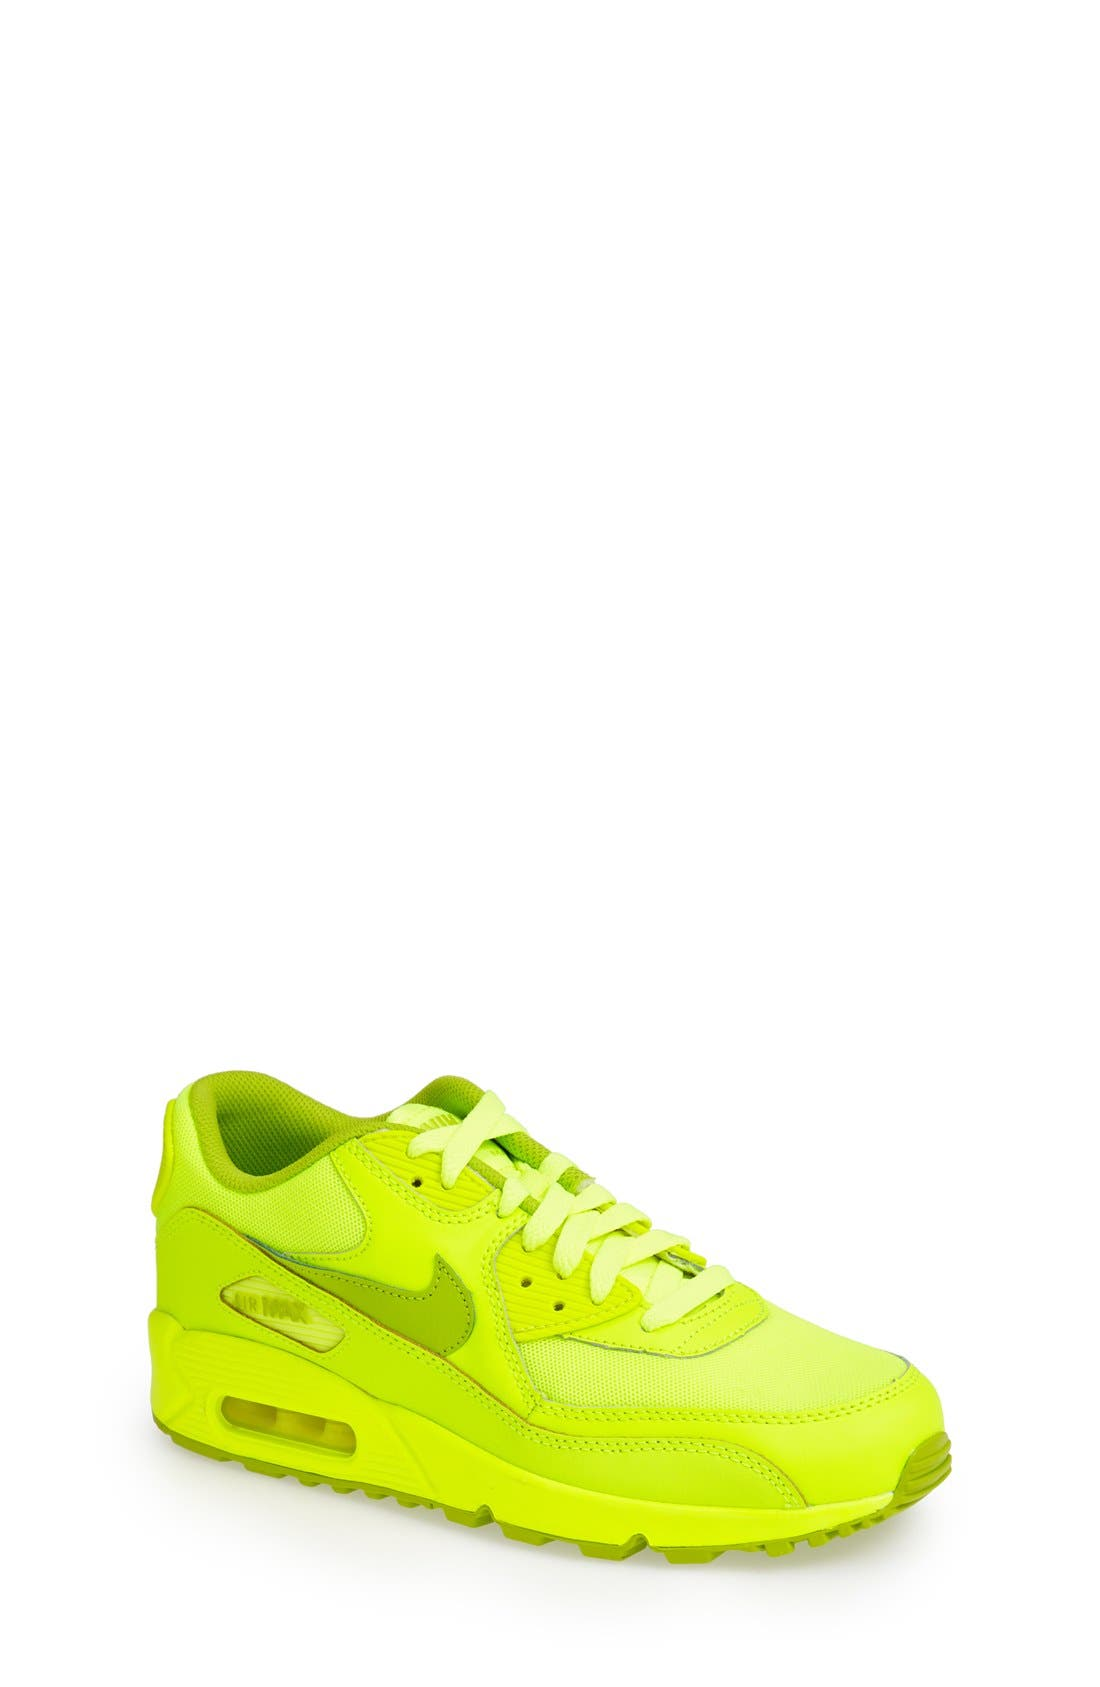 Alternate Image 1 Selected - Nike 'Air Max Classic' Running Shoe (Little Kid & Big Kid)